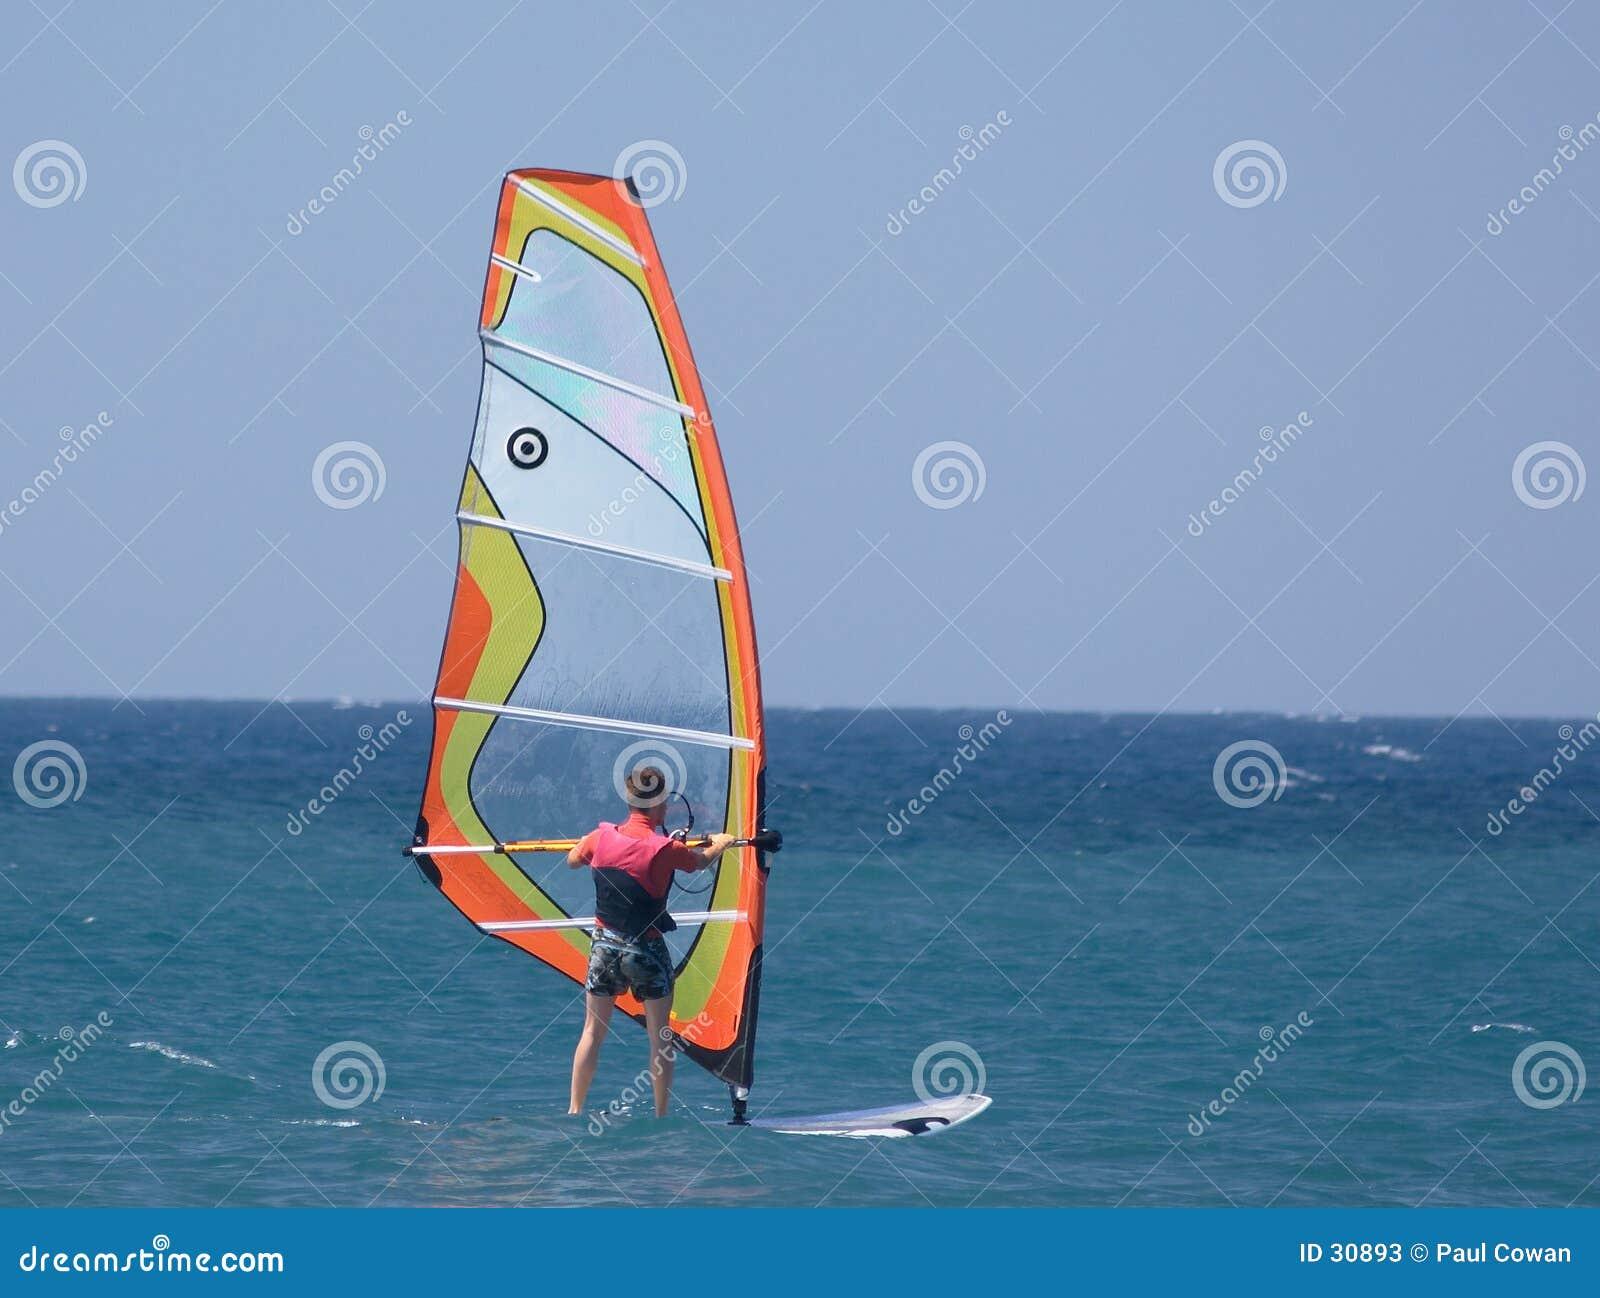 Sailboard sportsman